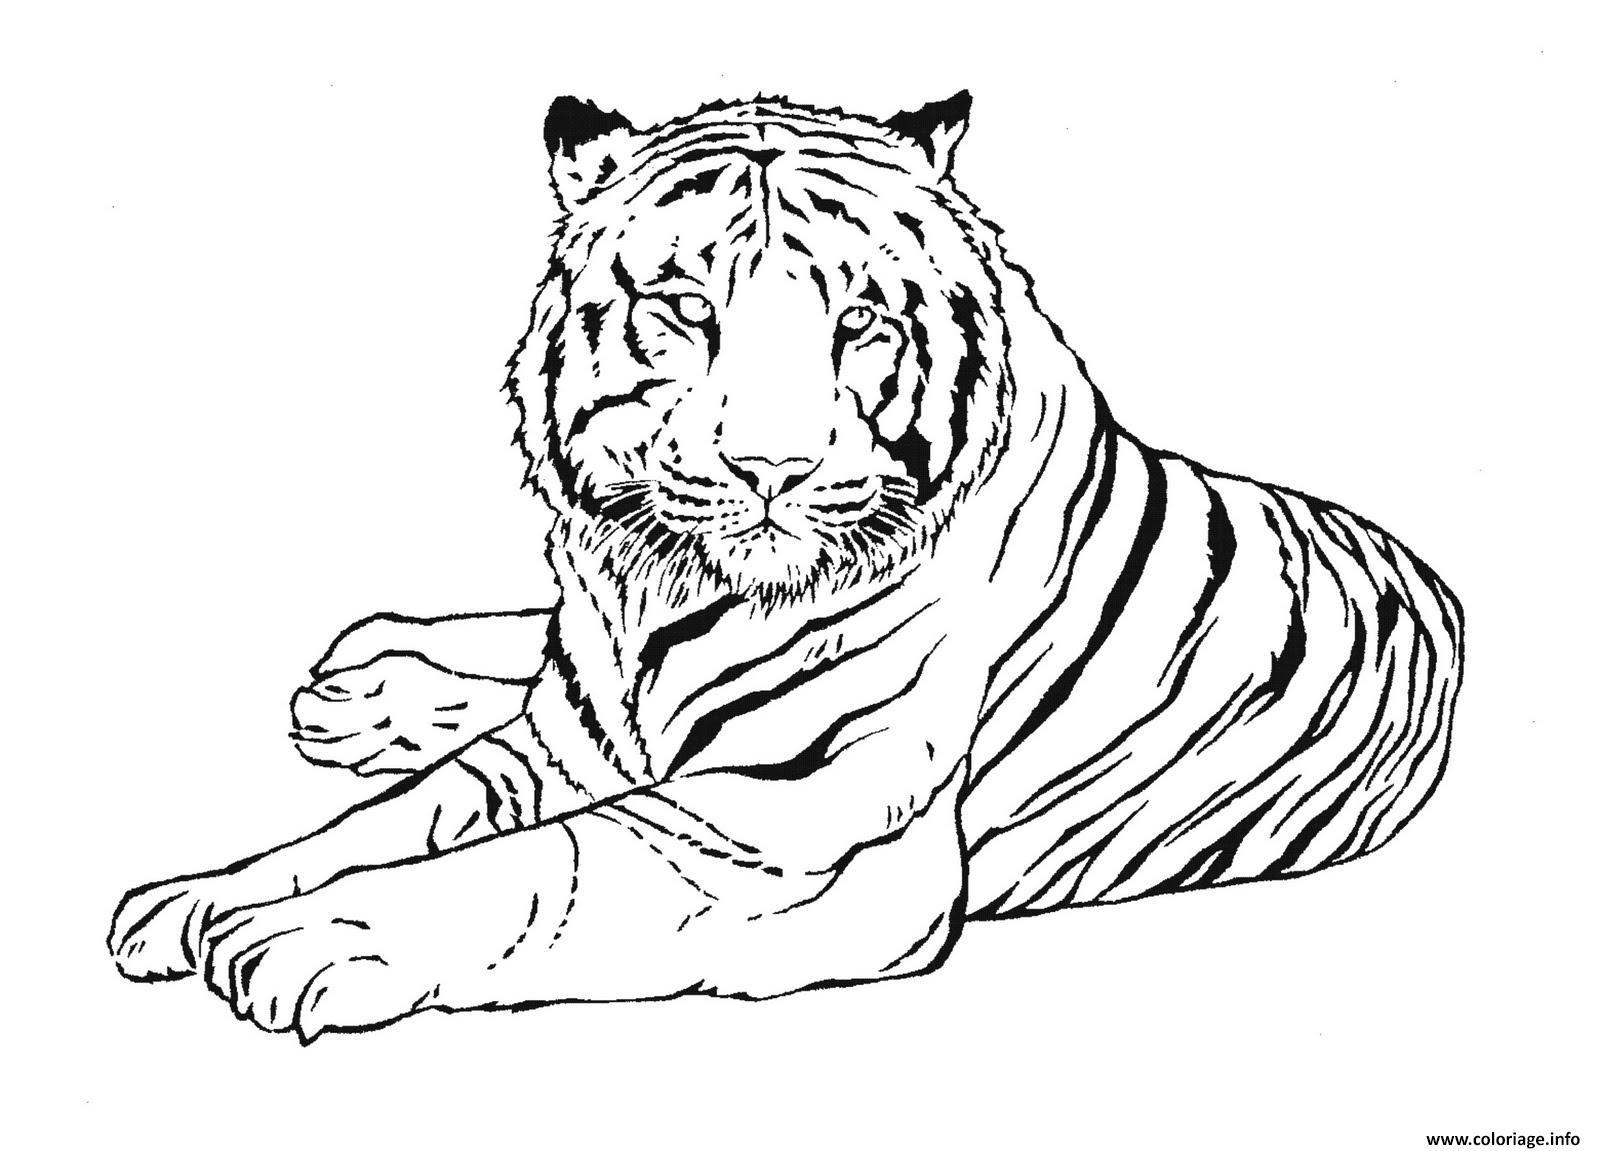 Coloriage Tigre De La Region Argentine De Buenos Aires Jecolorie Com